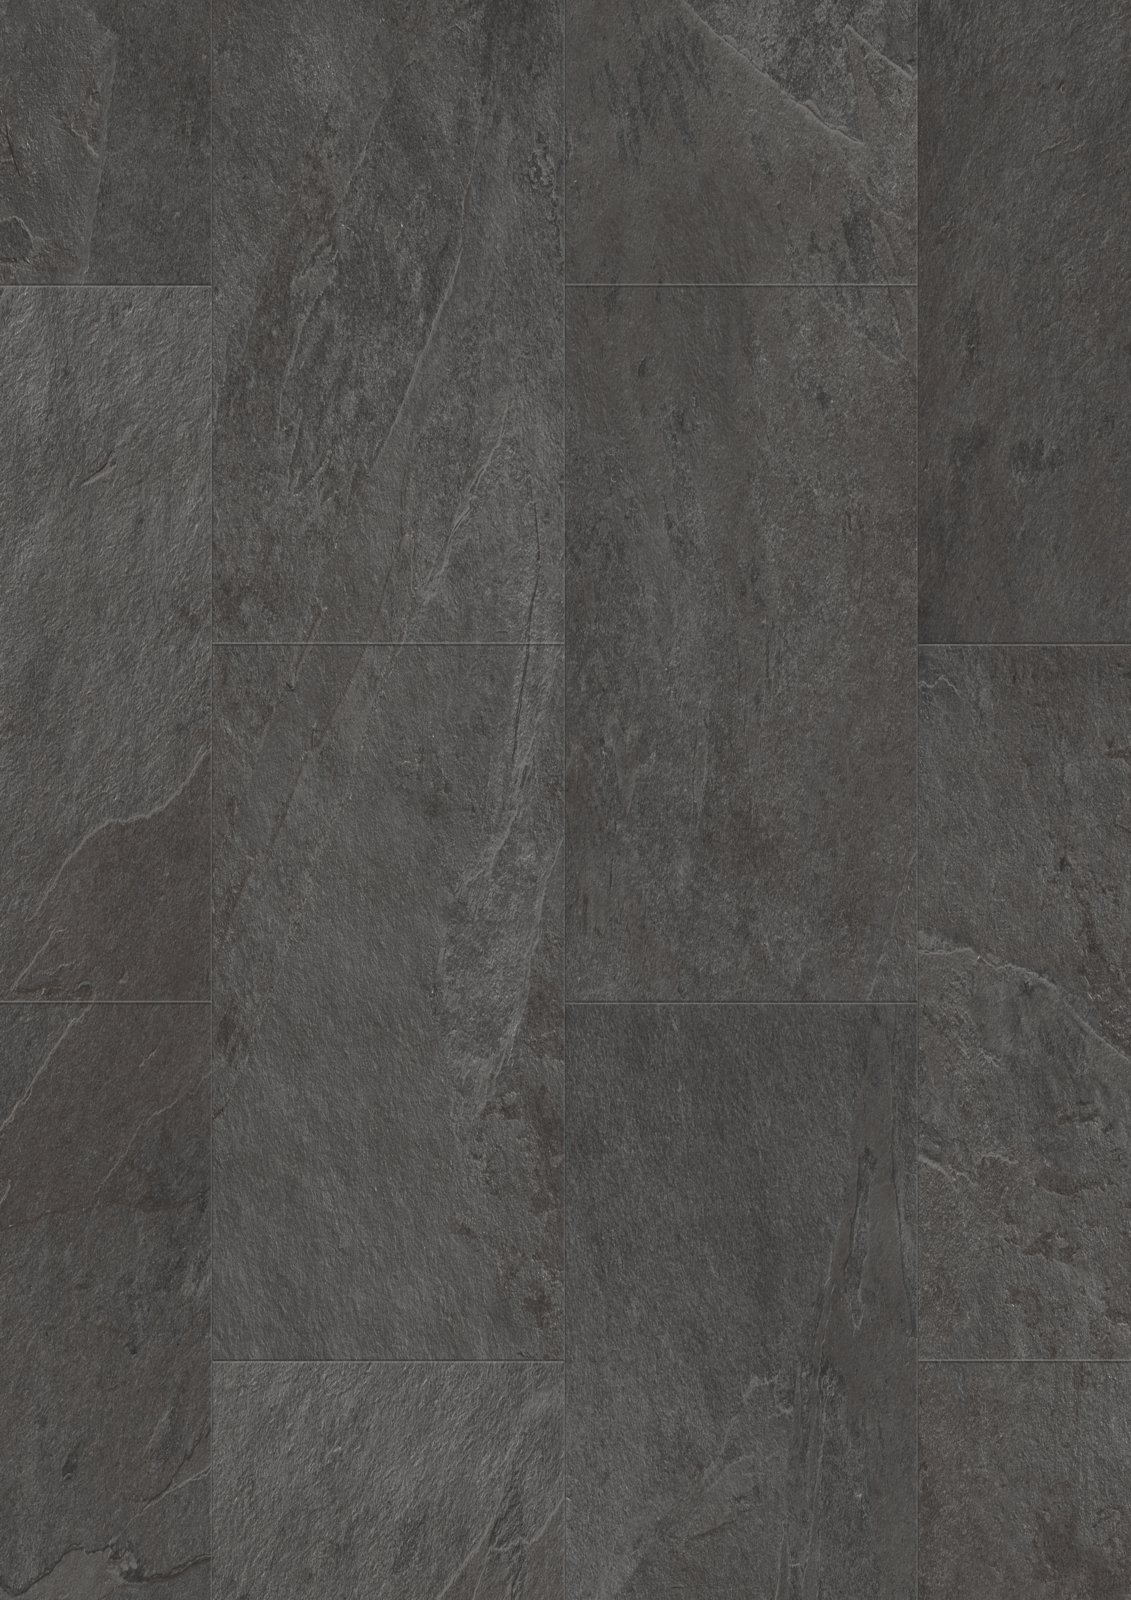 Vinyyli Pergo Premium 1300x320x4,5 mm Musta Scivaro Slate